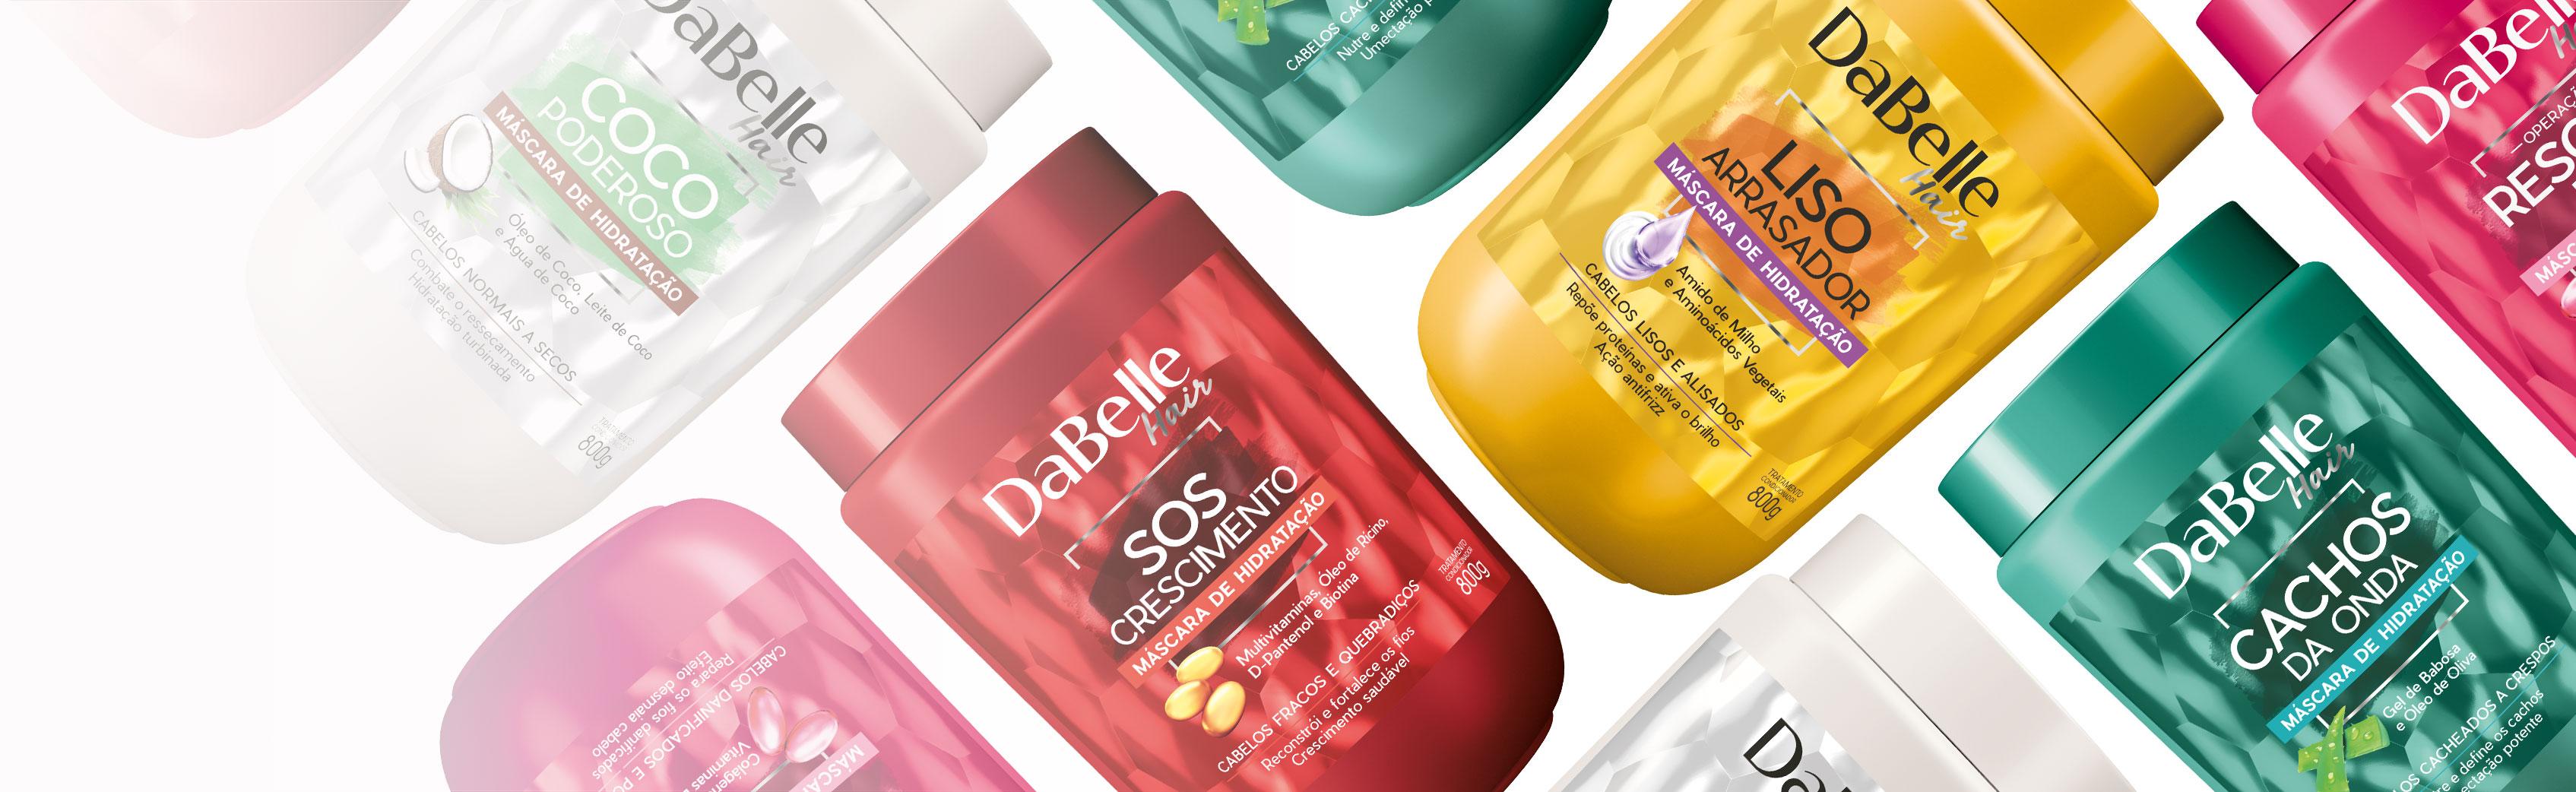 Tratamento DaBelle Hair para Cabelos